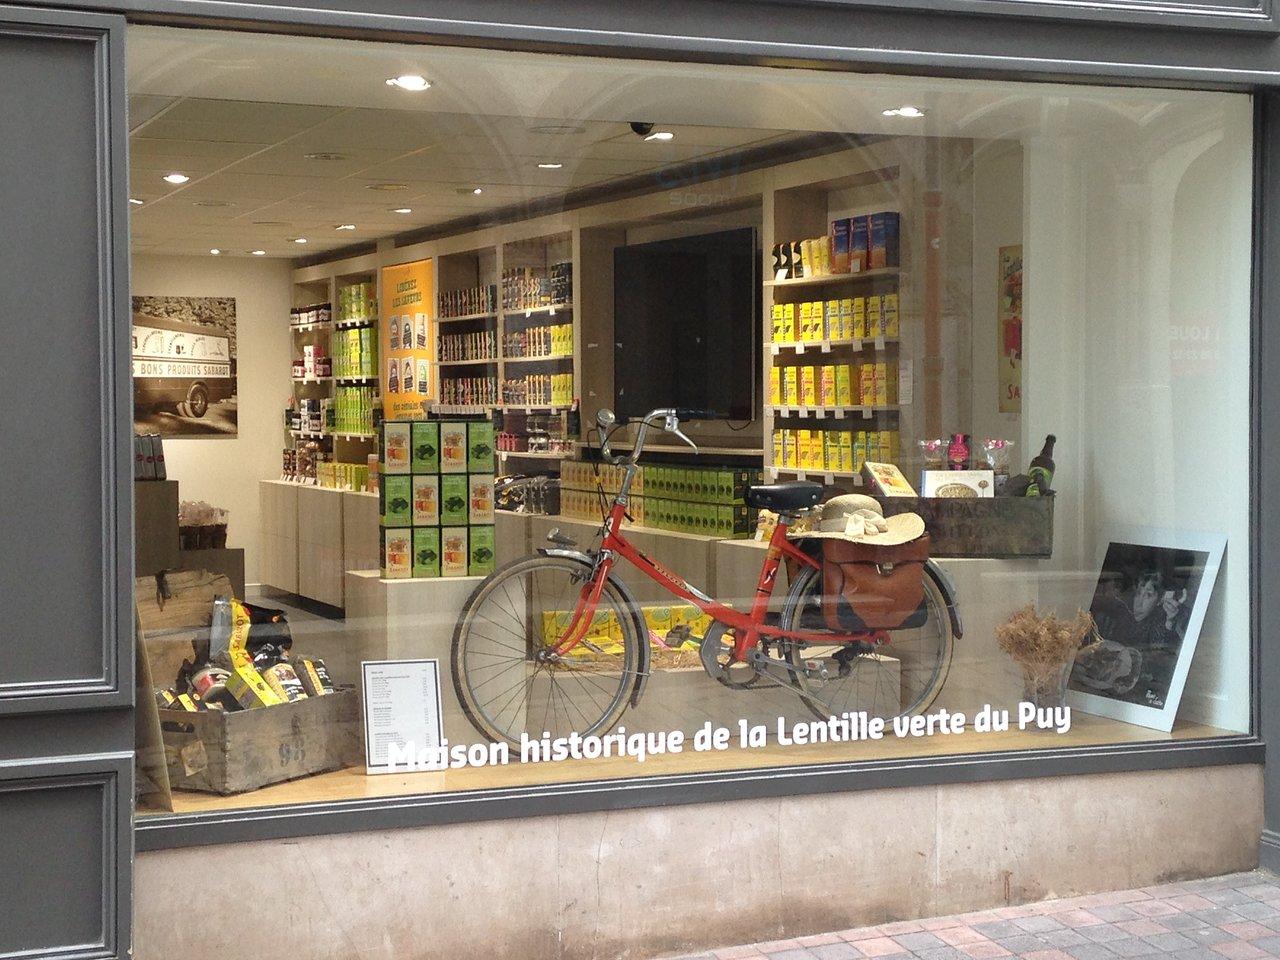 Malle Bar Maison Du Monde sabarot shop (le puy-en-velay, france): hours, address